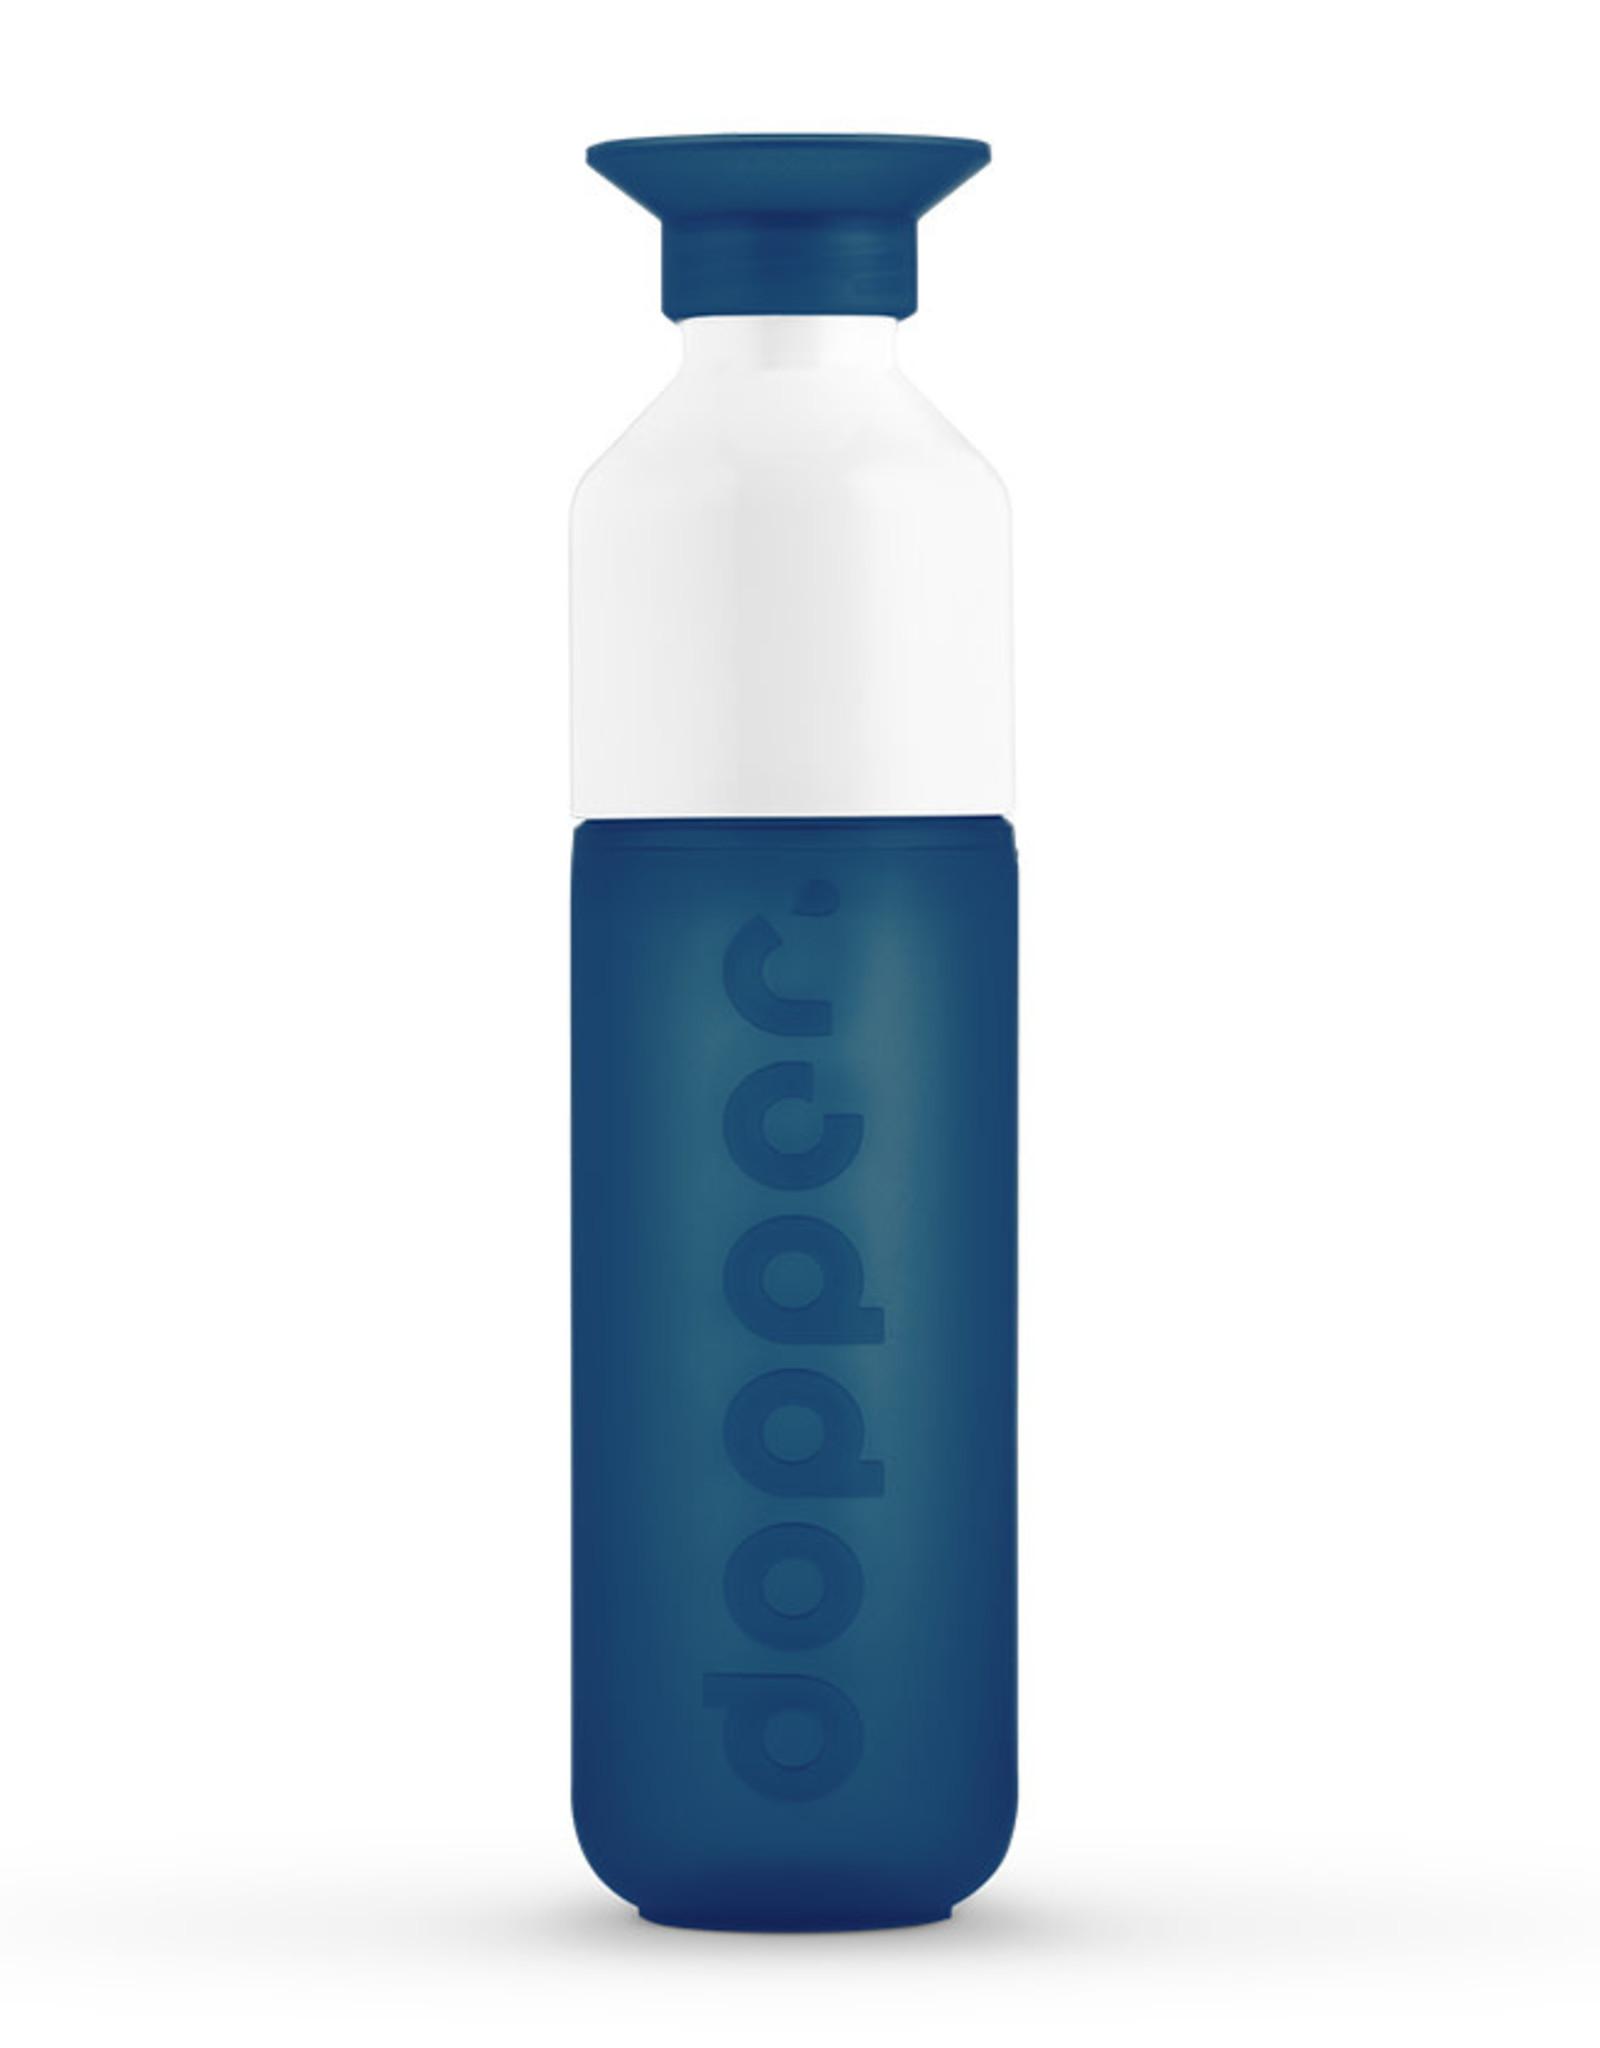 Dopper Dopper Original 450ml Cosmic Storm-dark blue